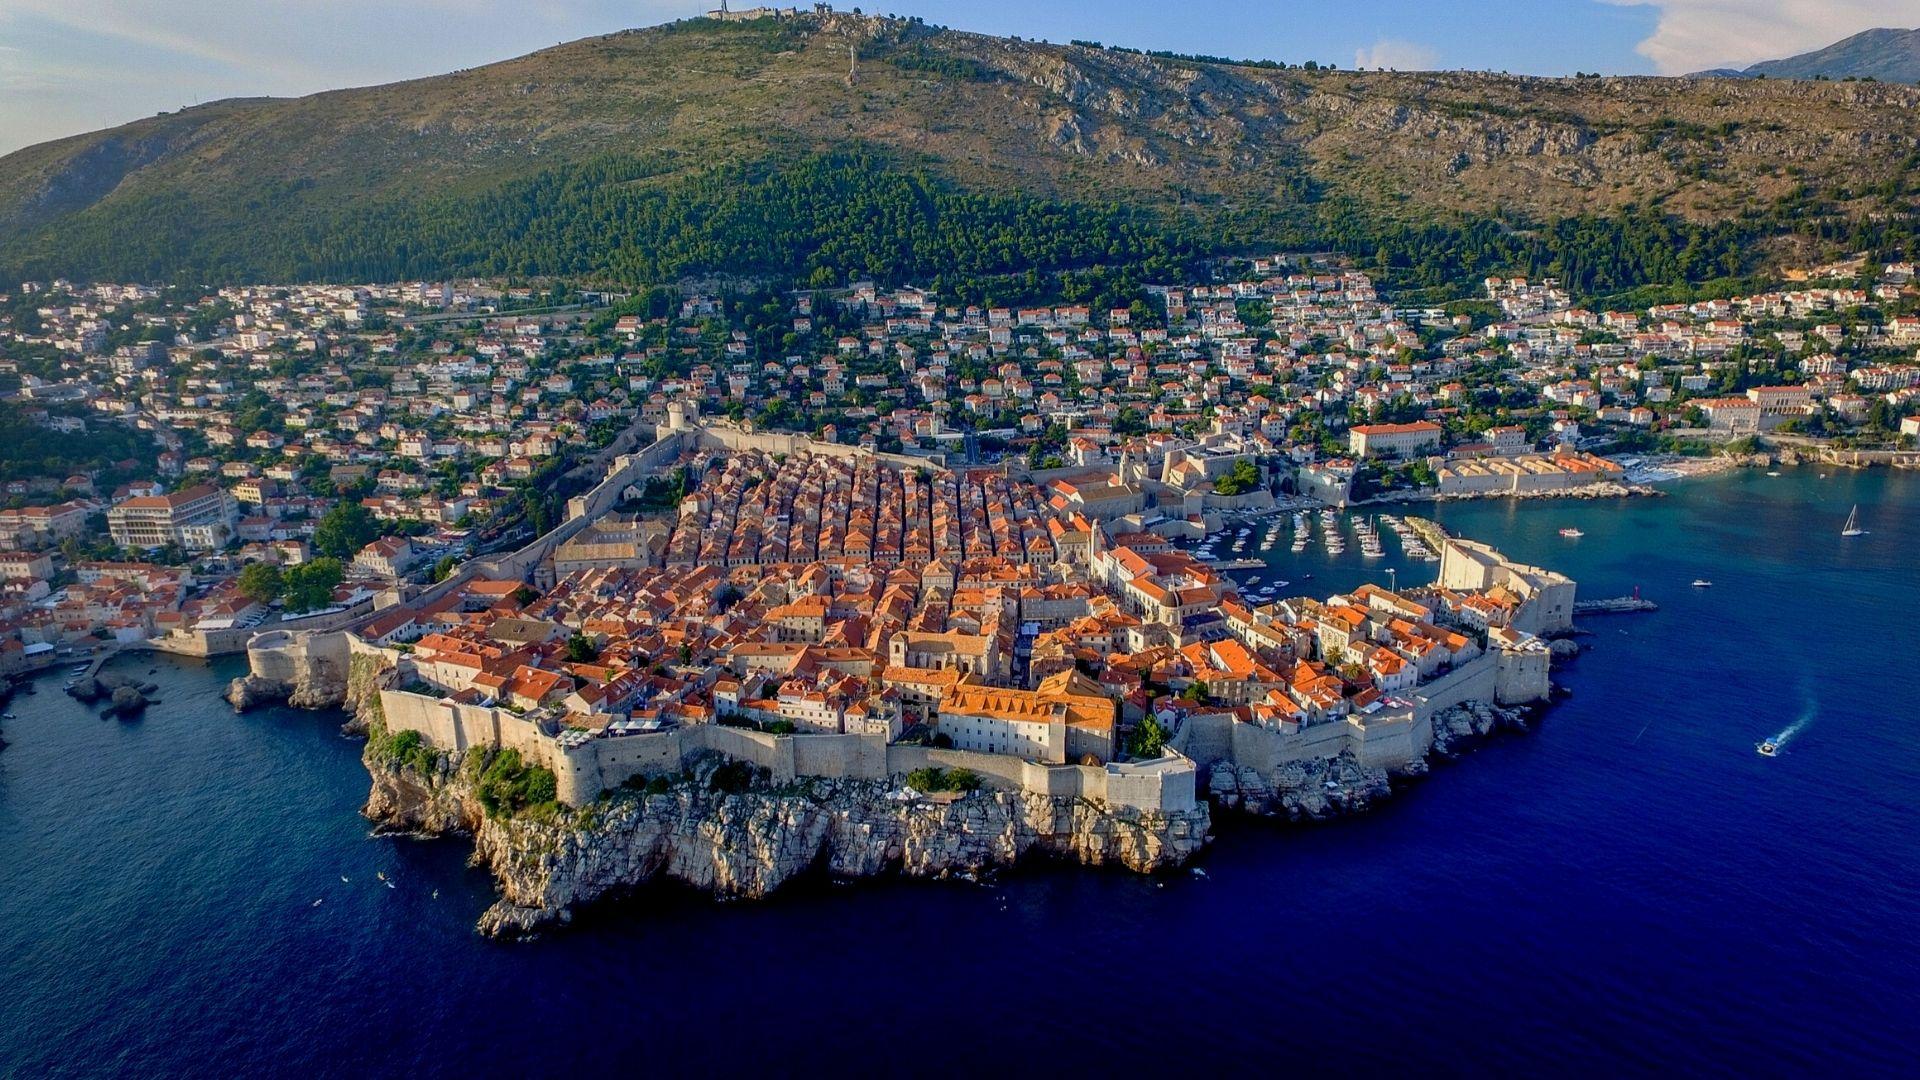 Croatia, Slovenia & the Adriatic Coast Oct 2022